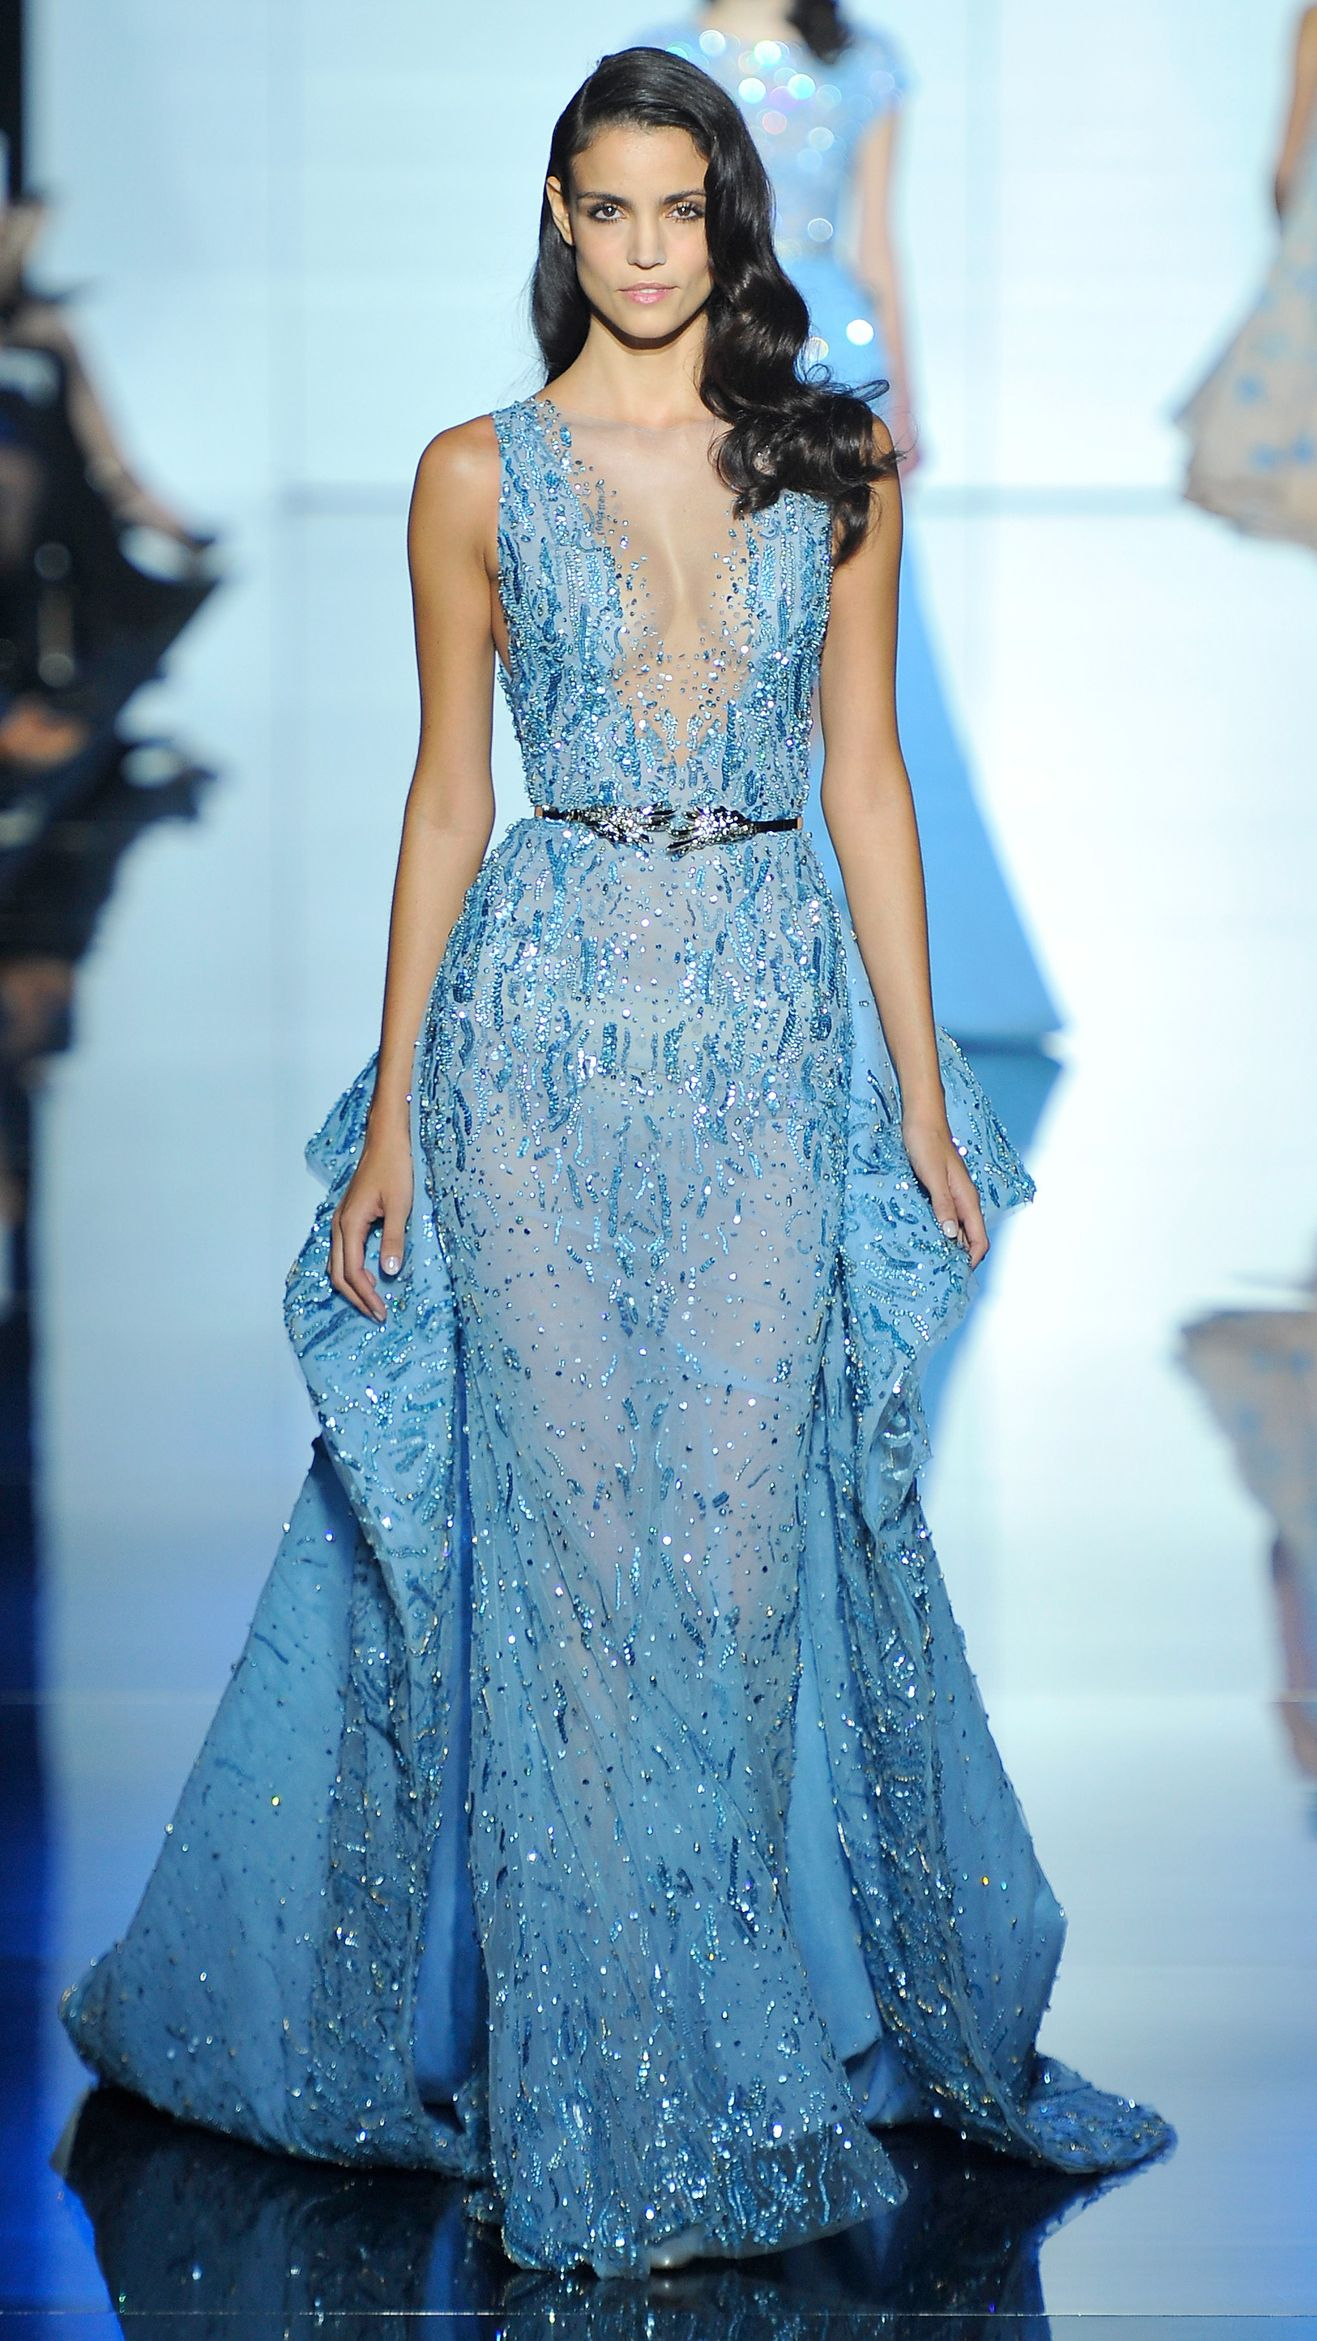 Zuhair Murad Haute Couture Spring/Summer 2015.